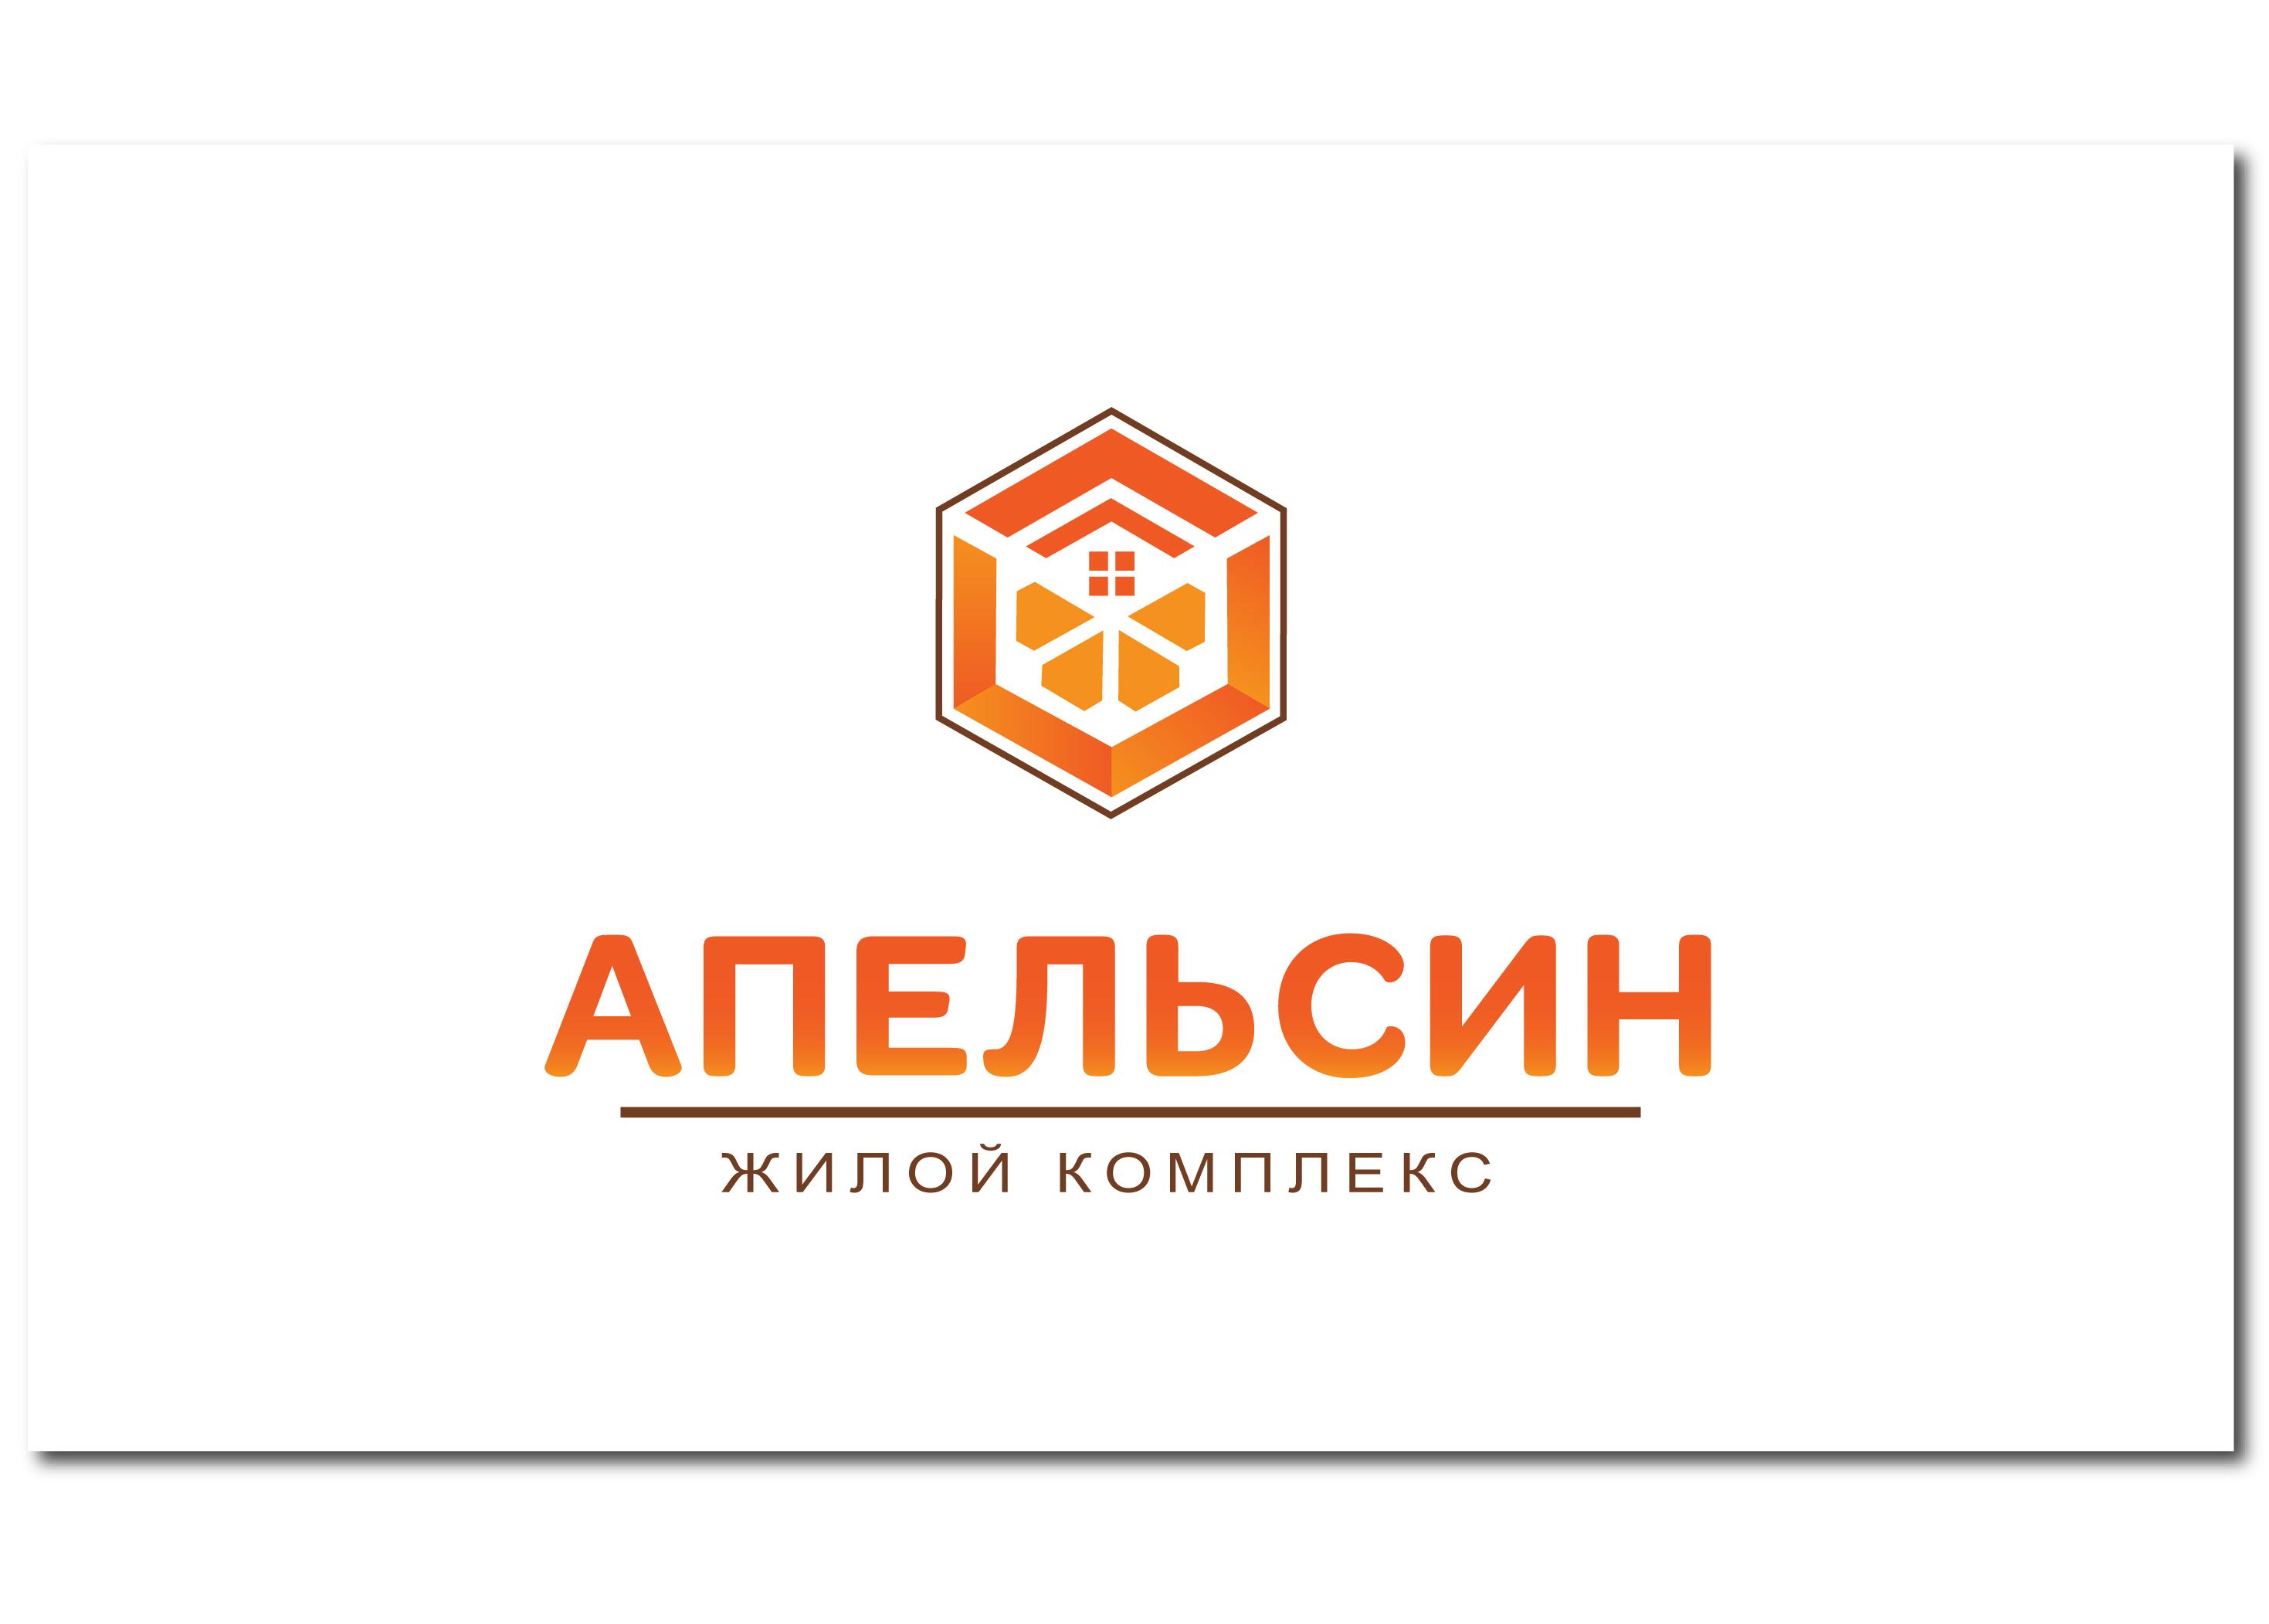 Логотип и фирменный стиль фото f_2555a722dec4f6c9.jpg